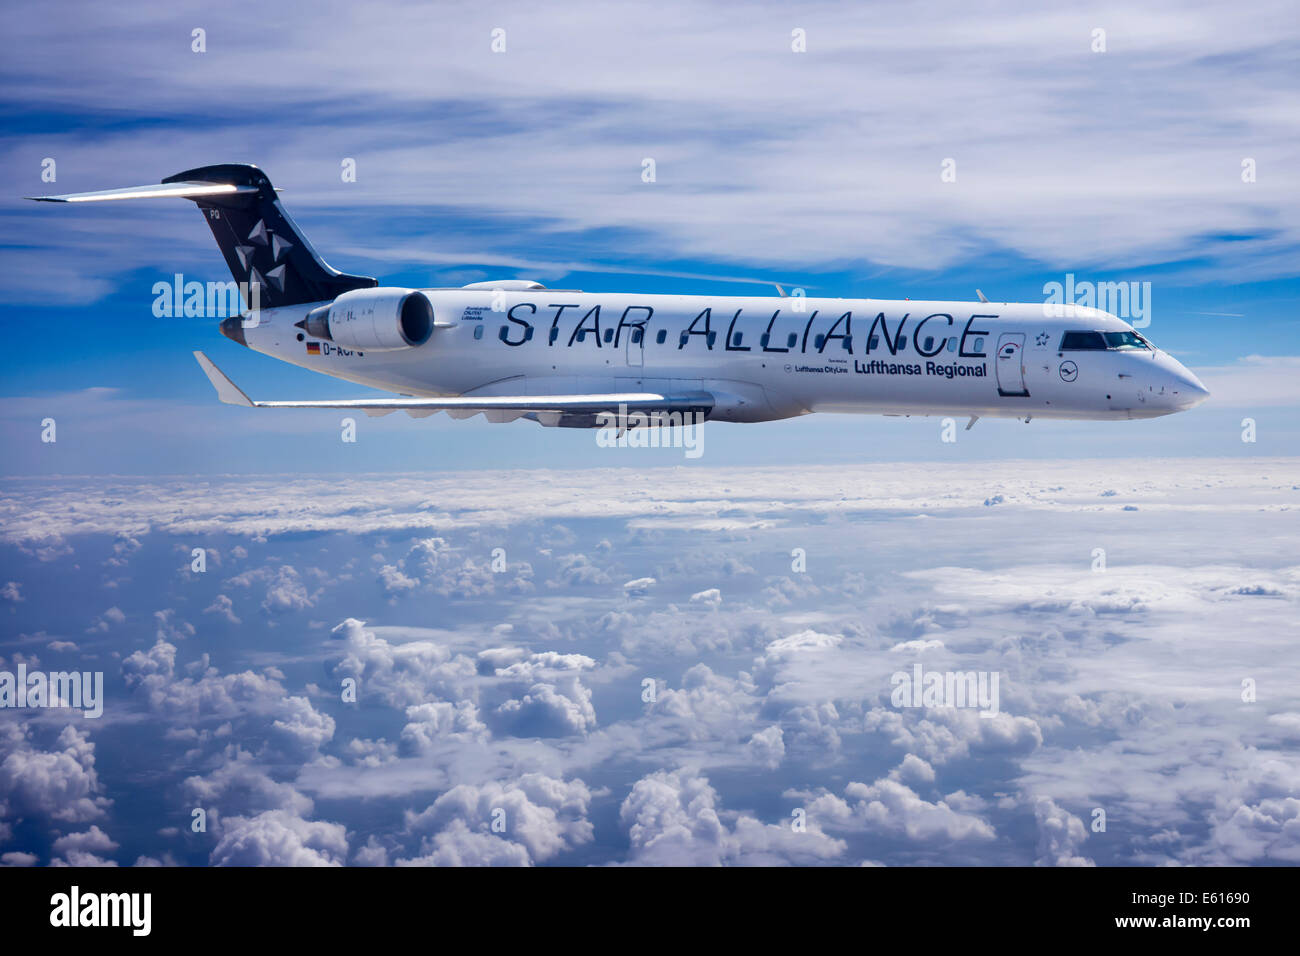 Star Alliance, Bombardier CRJ 700 aircraft, in flight Stock